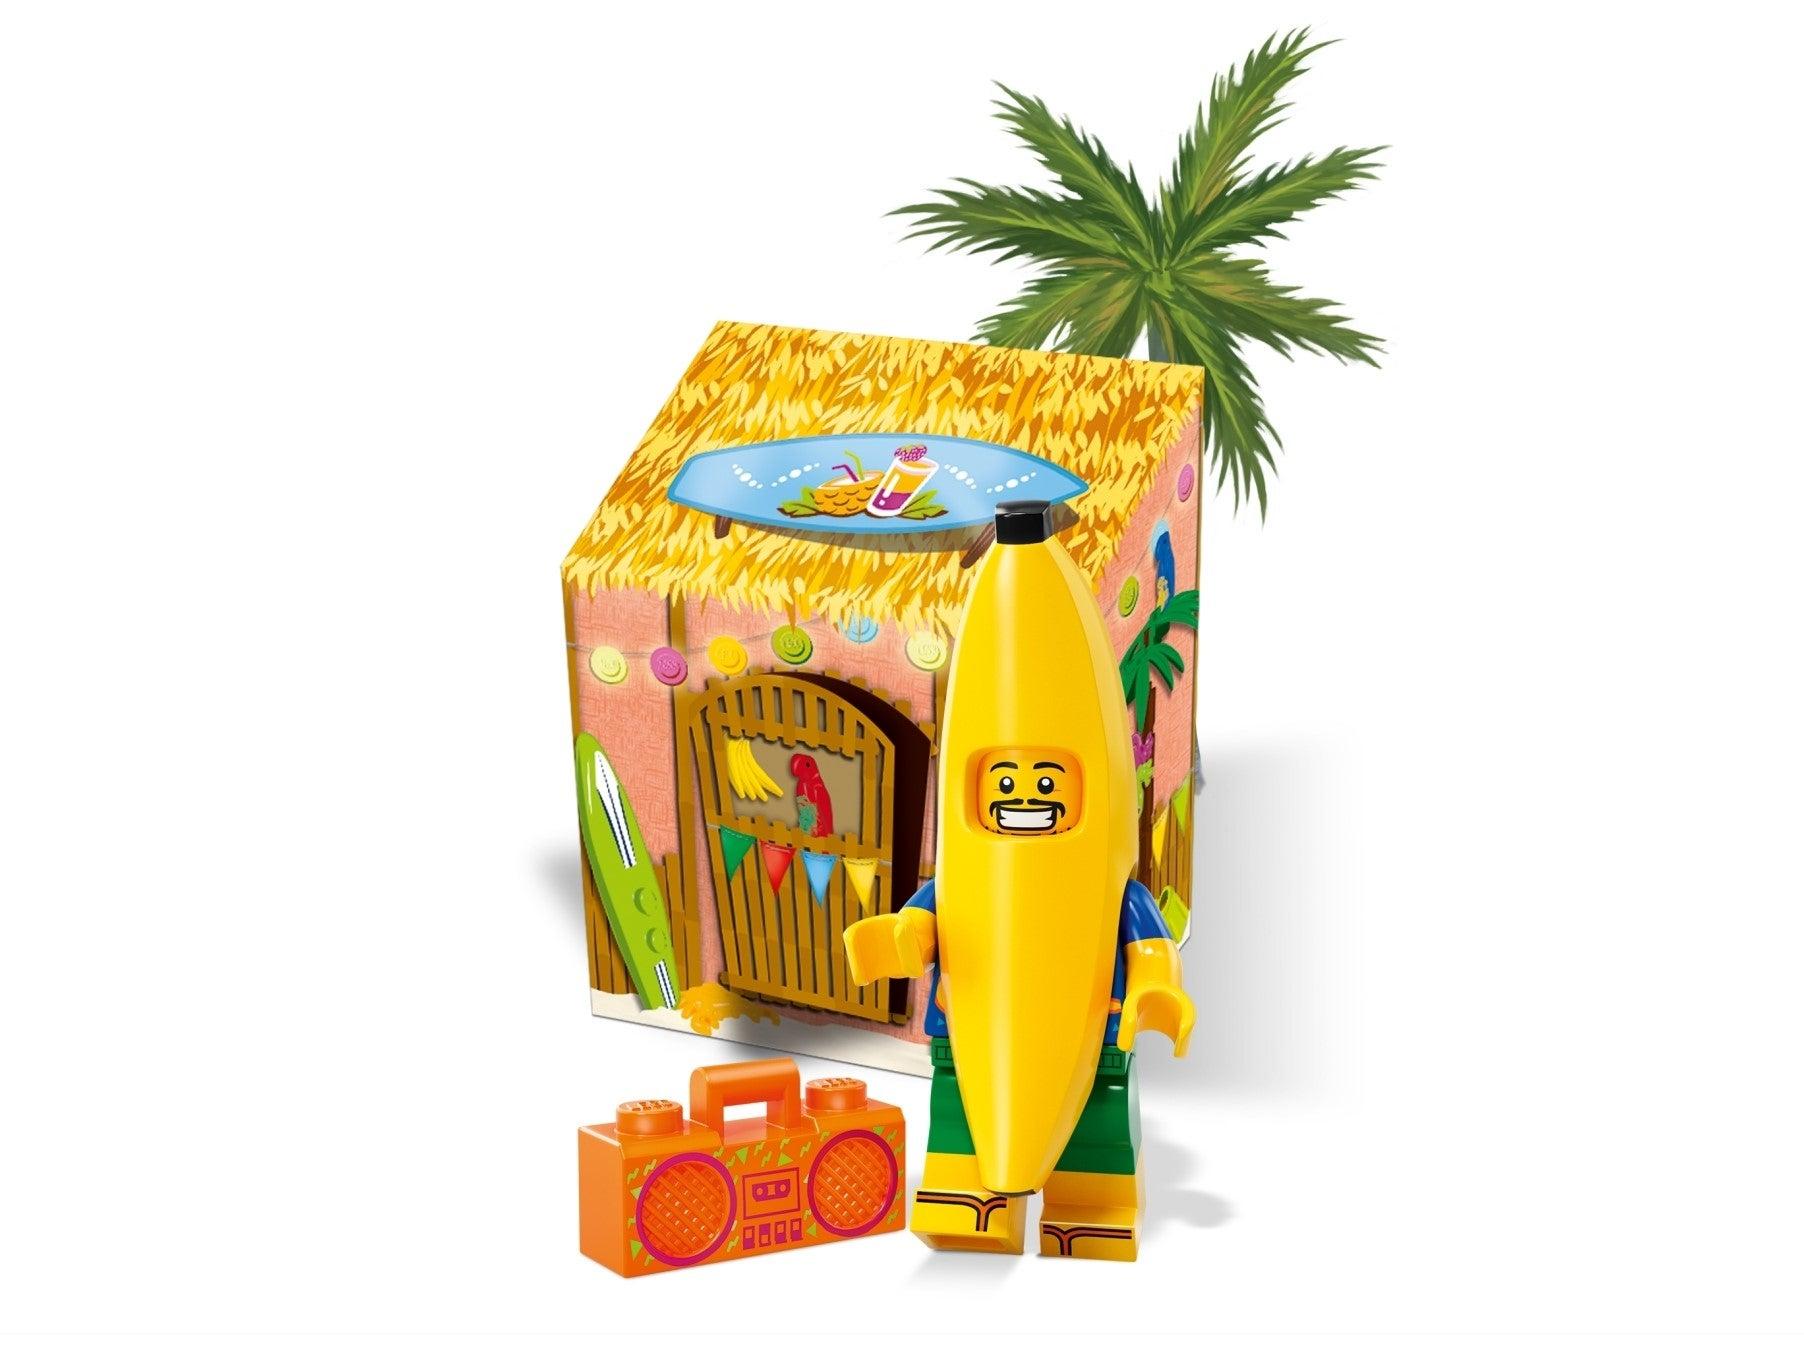 Lego Party Banana Man MINIFIGURE Juice Bar Boom Box 6217088 5005250 SHIPS FREE